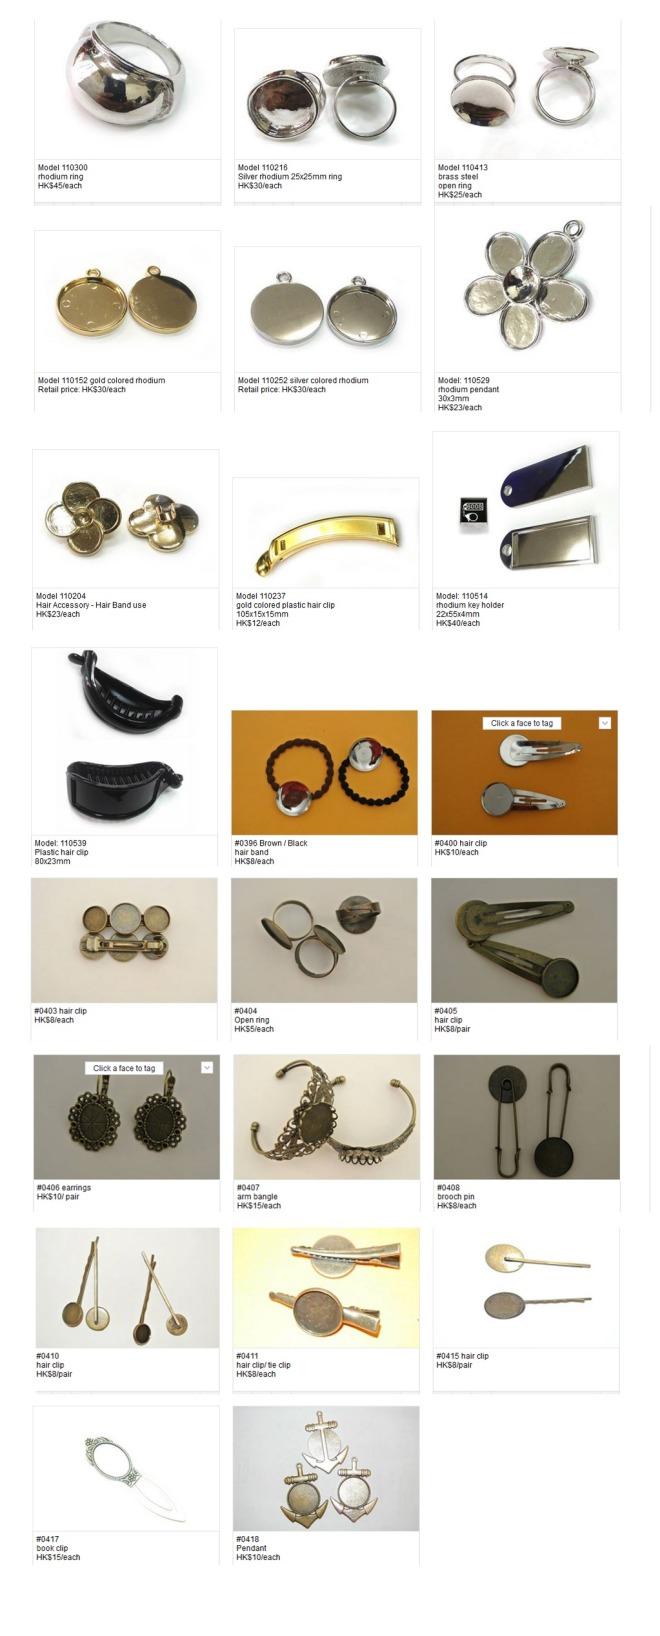 parts catalog update 11/9/2014